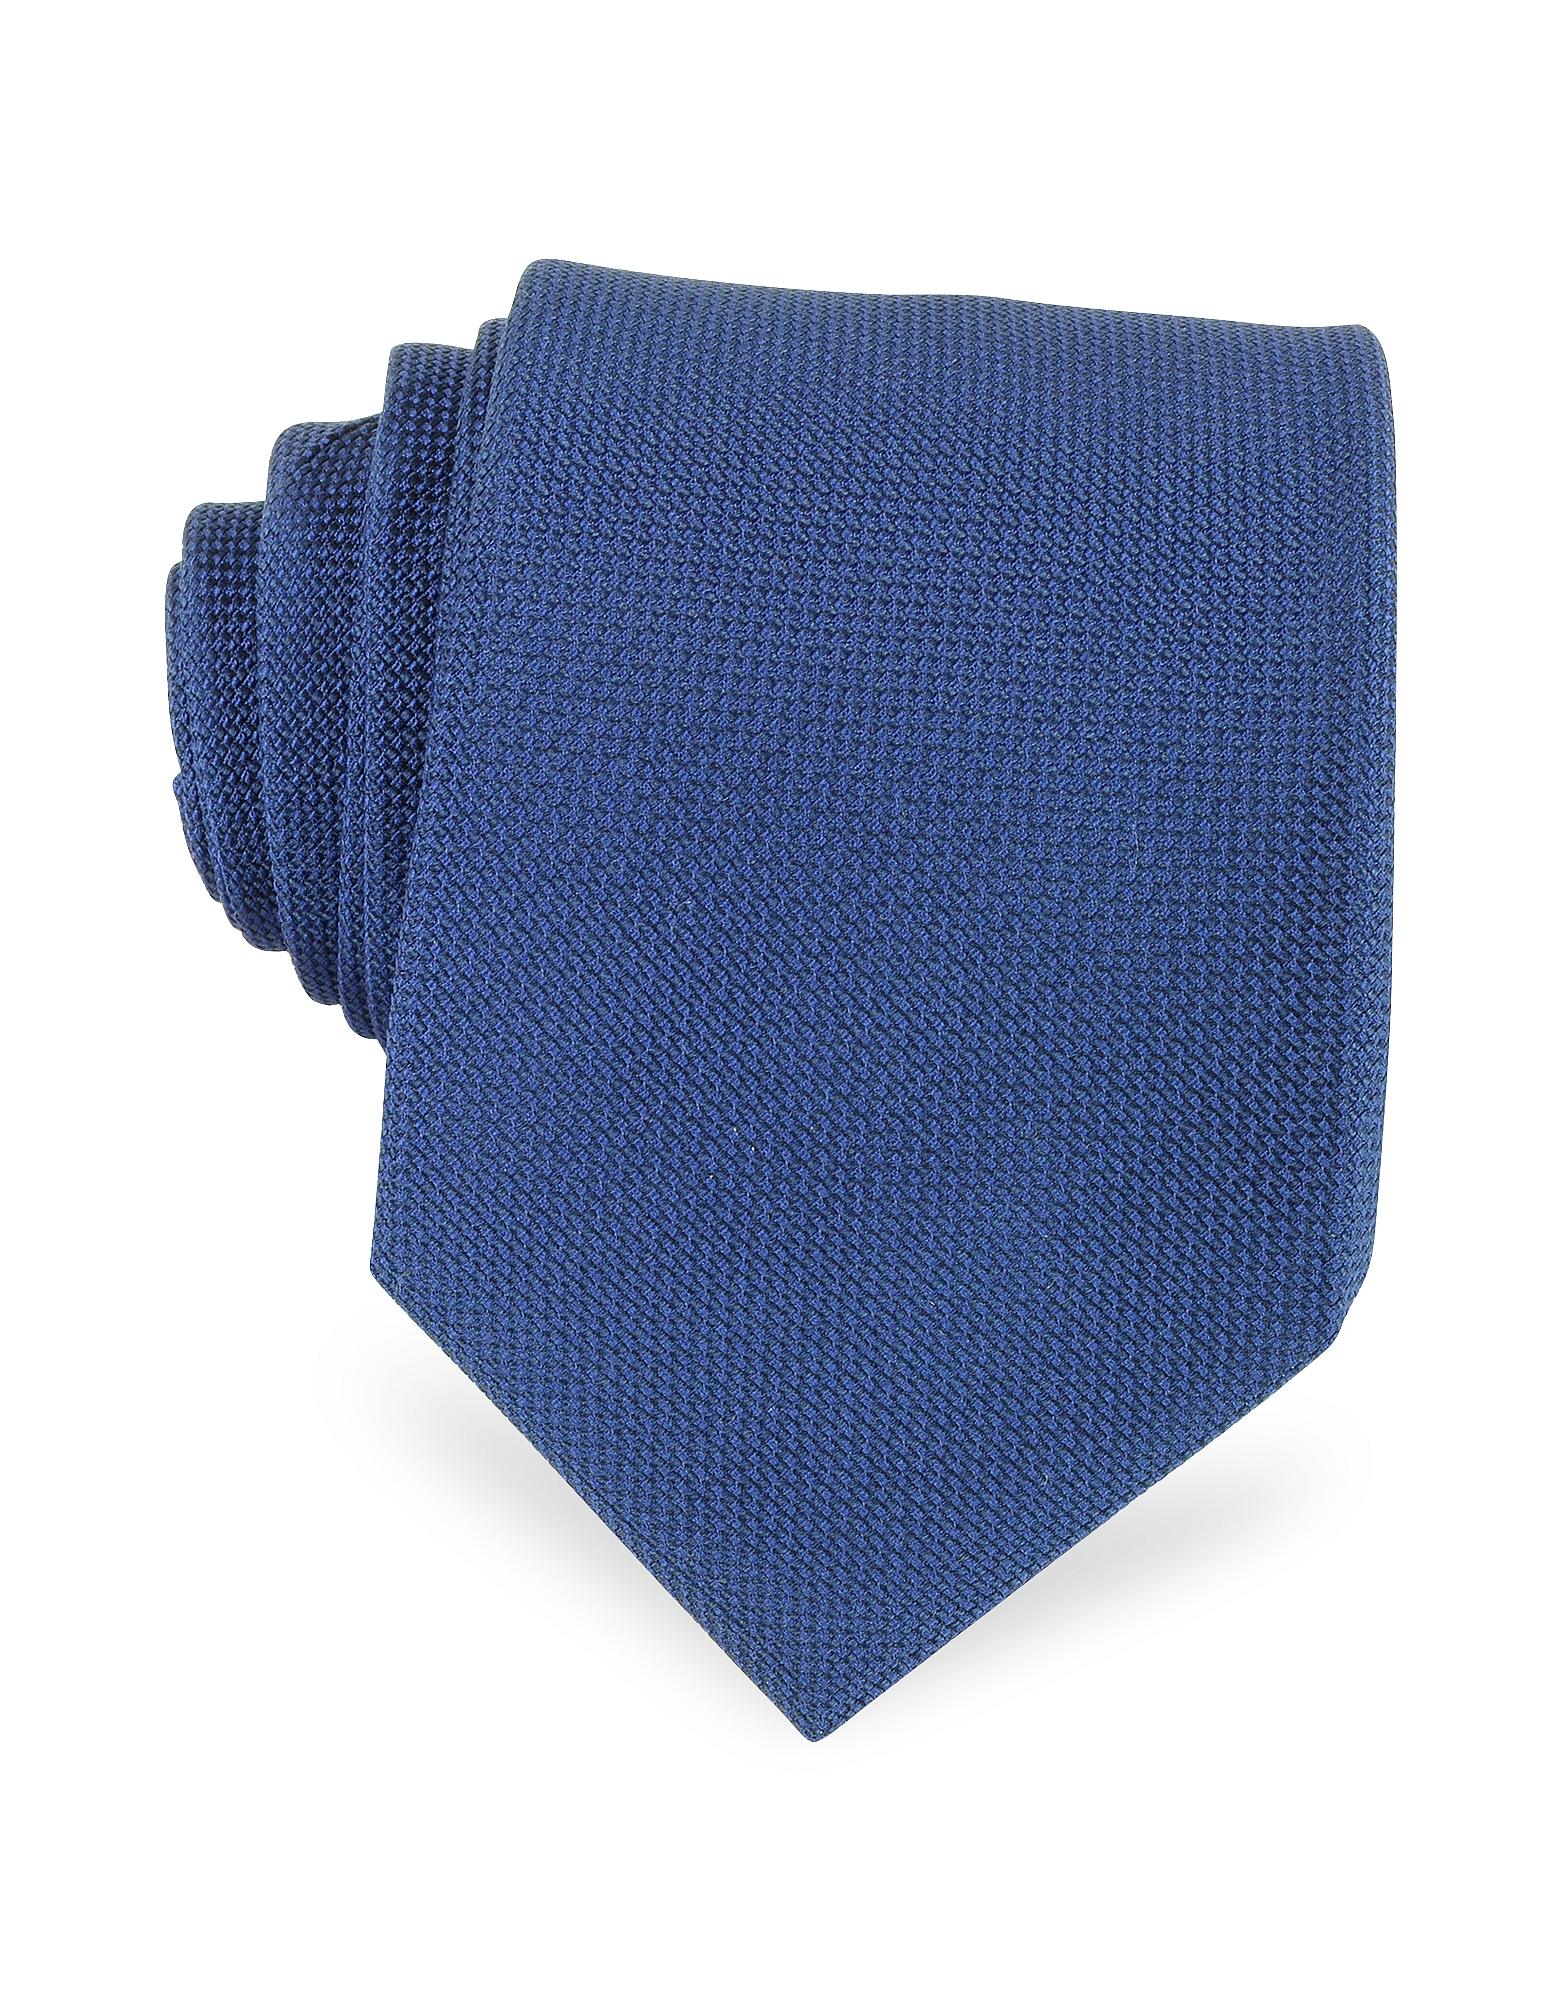 Forzieri Ties, Solid Woven Silk Tie